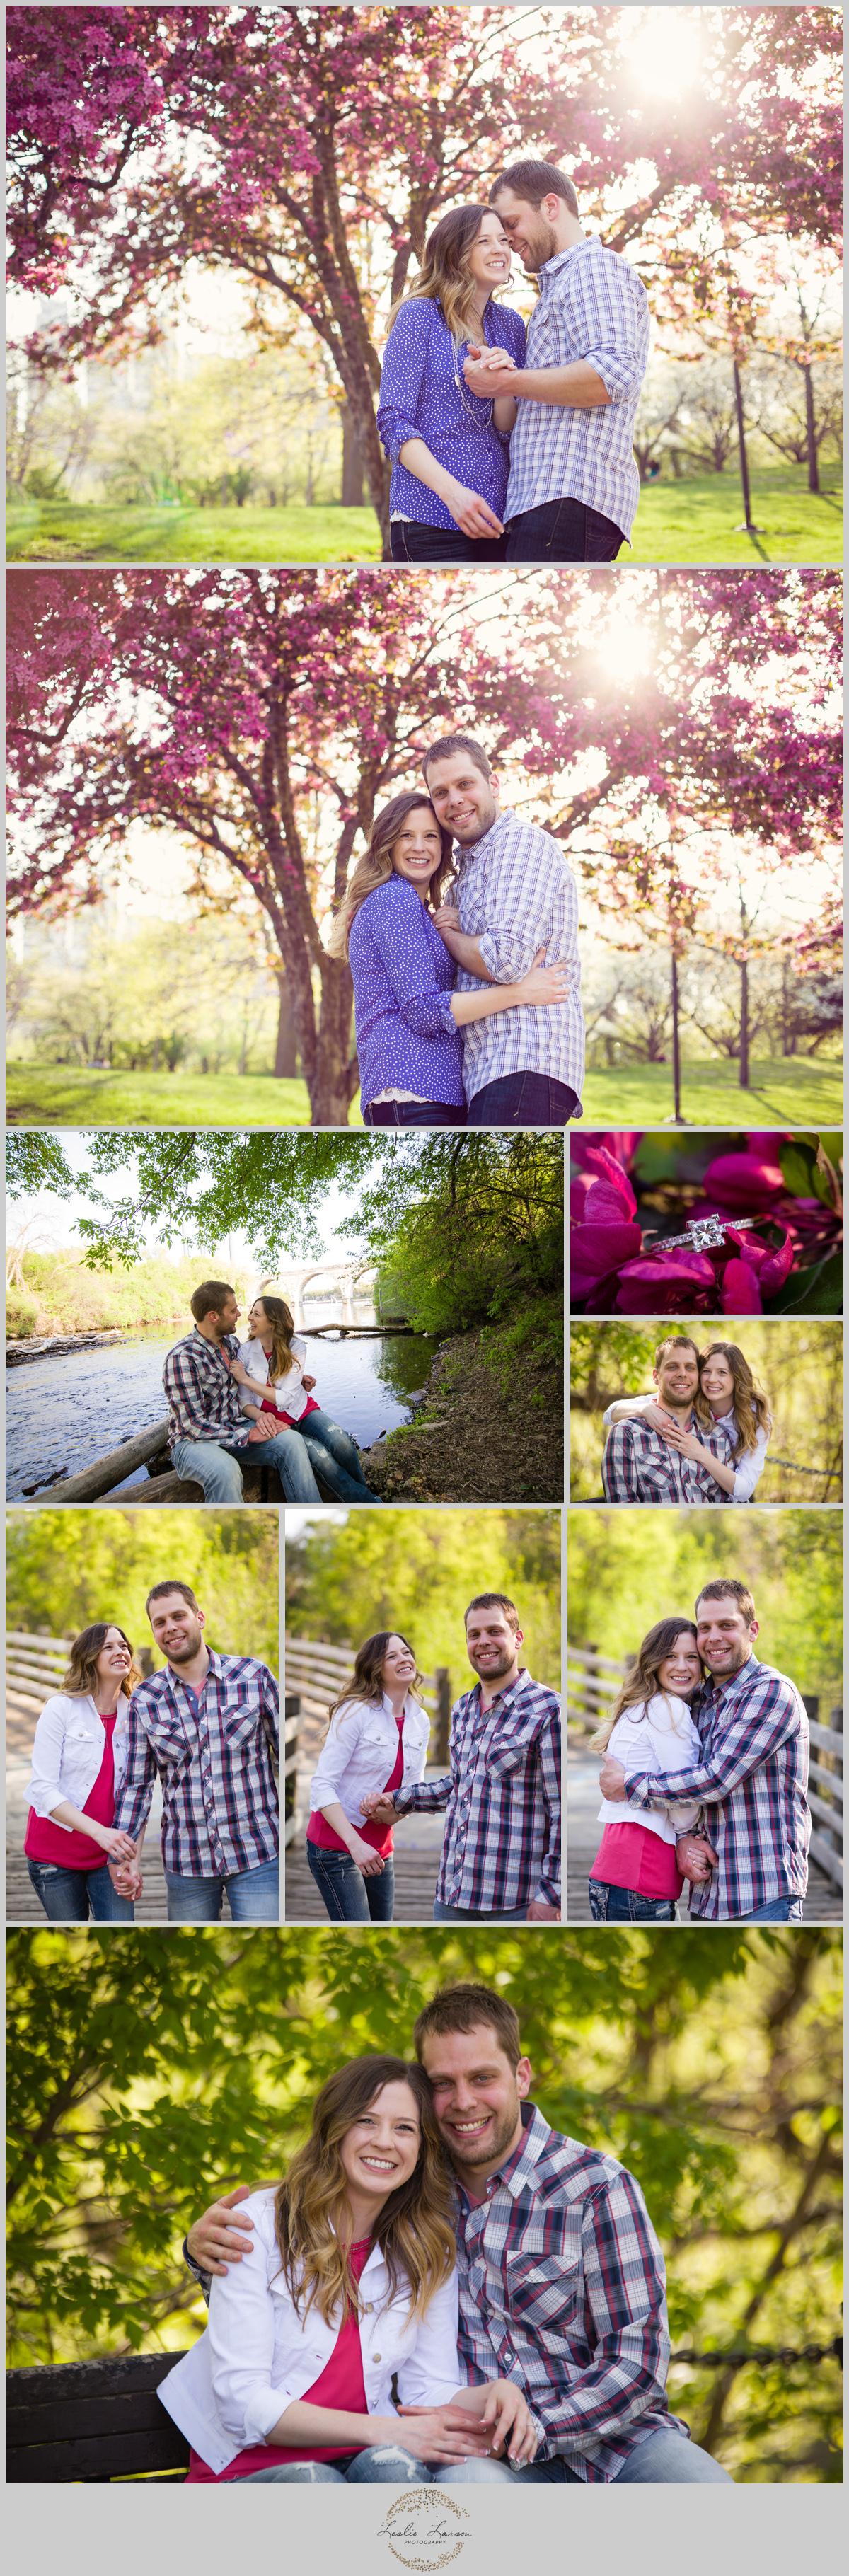 stone arch bridge engagement session spring wedding leslie larson photography